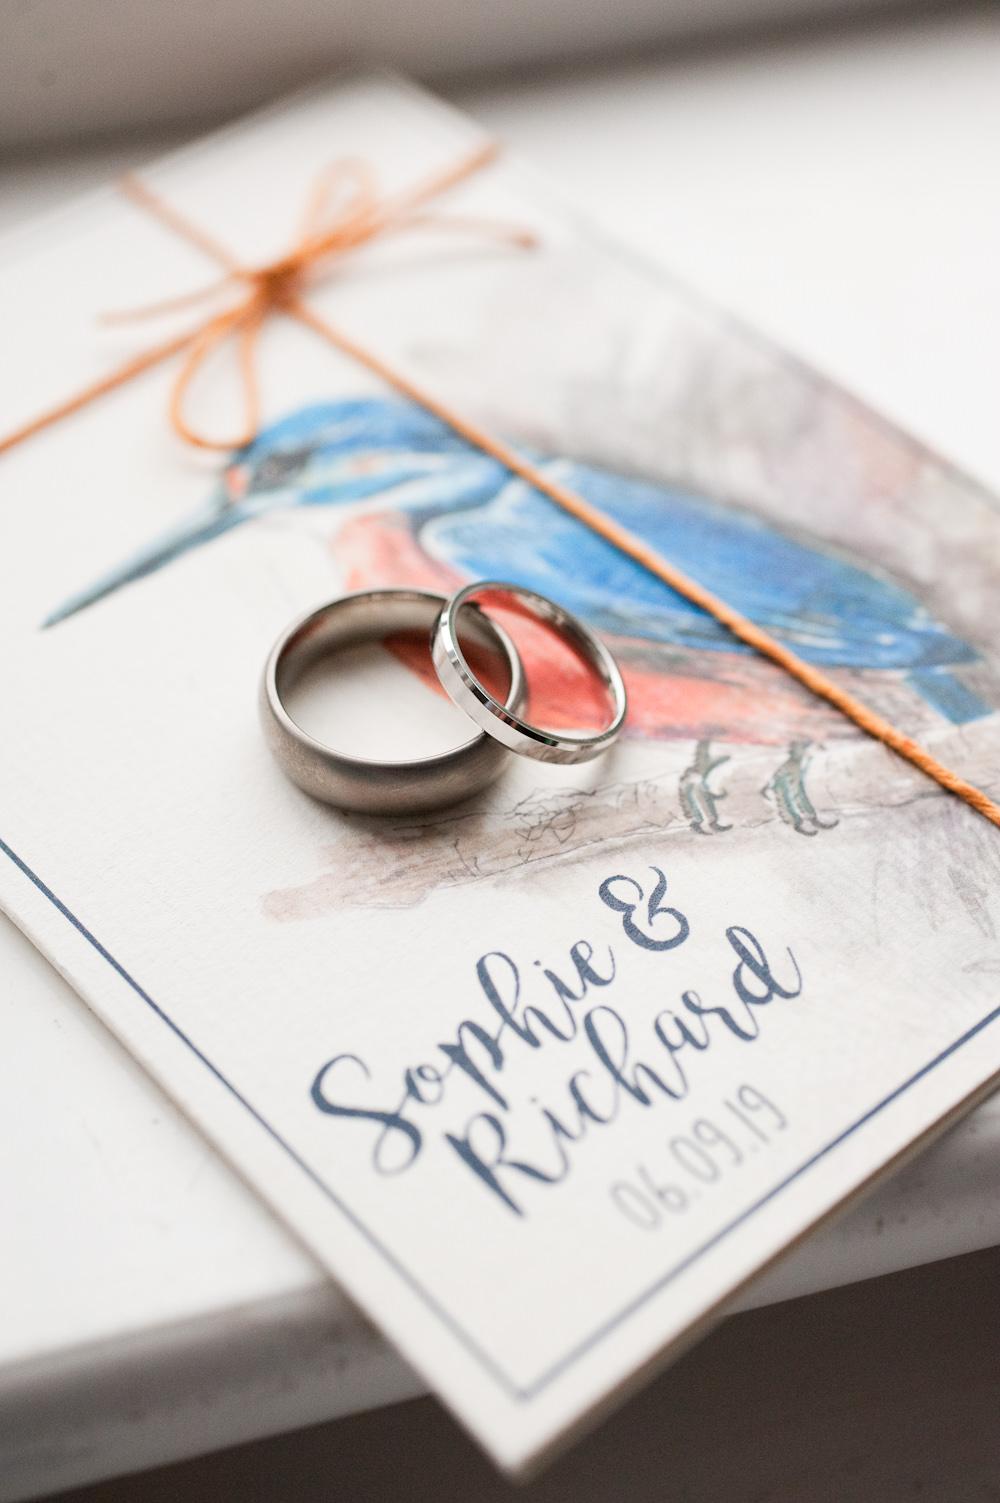 Floral Wedding Rachael Connerton Photography Bird Stationery Invite Invitation Rings